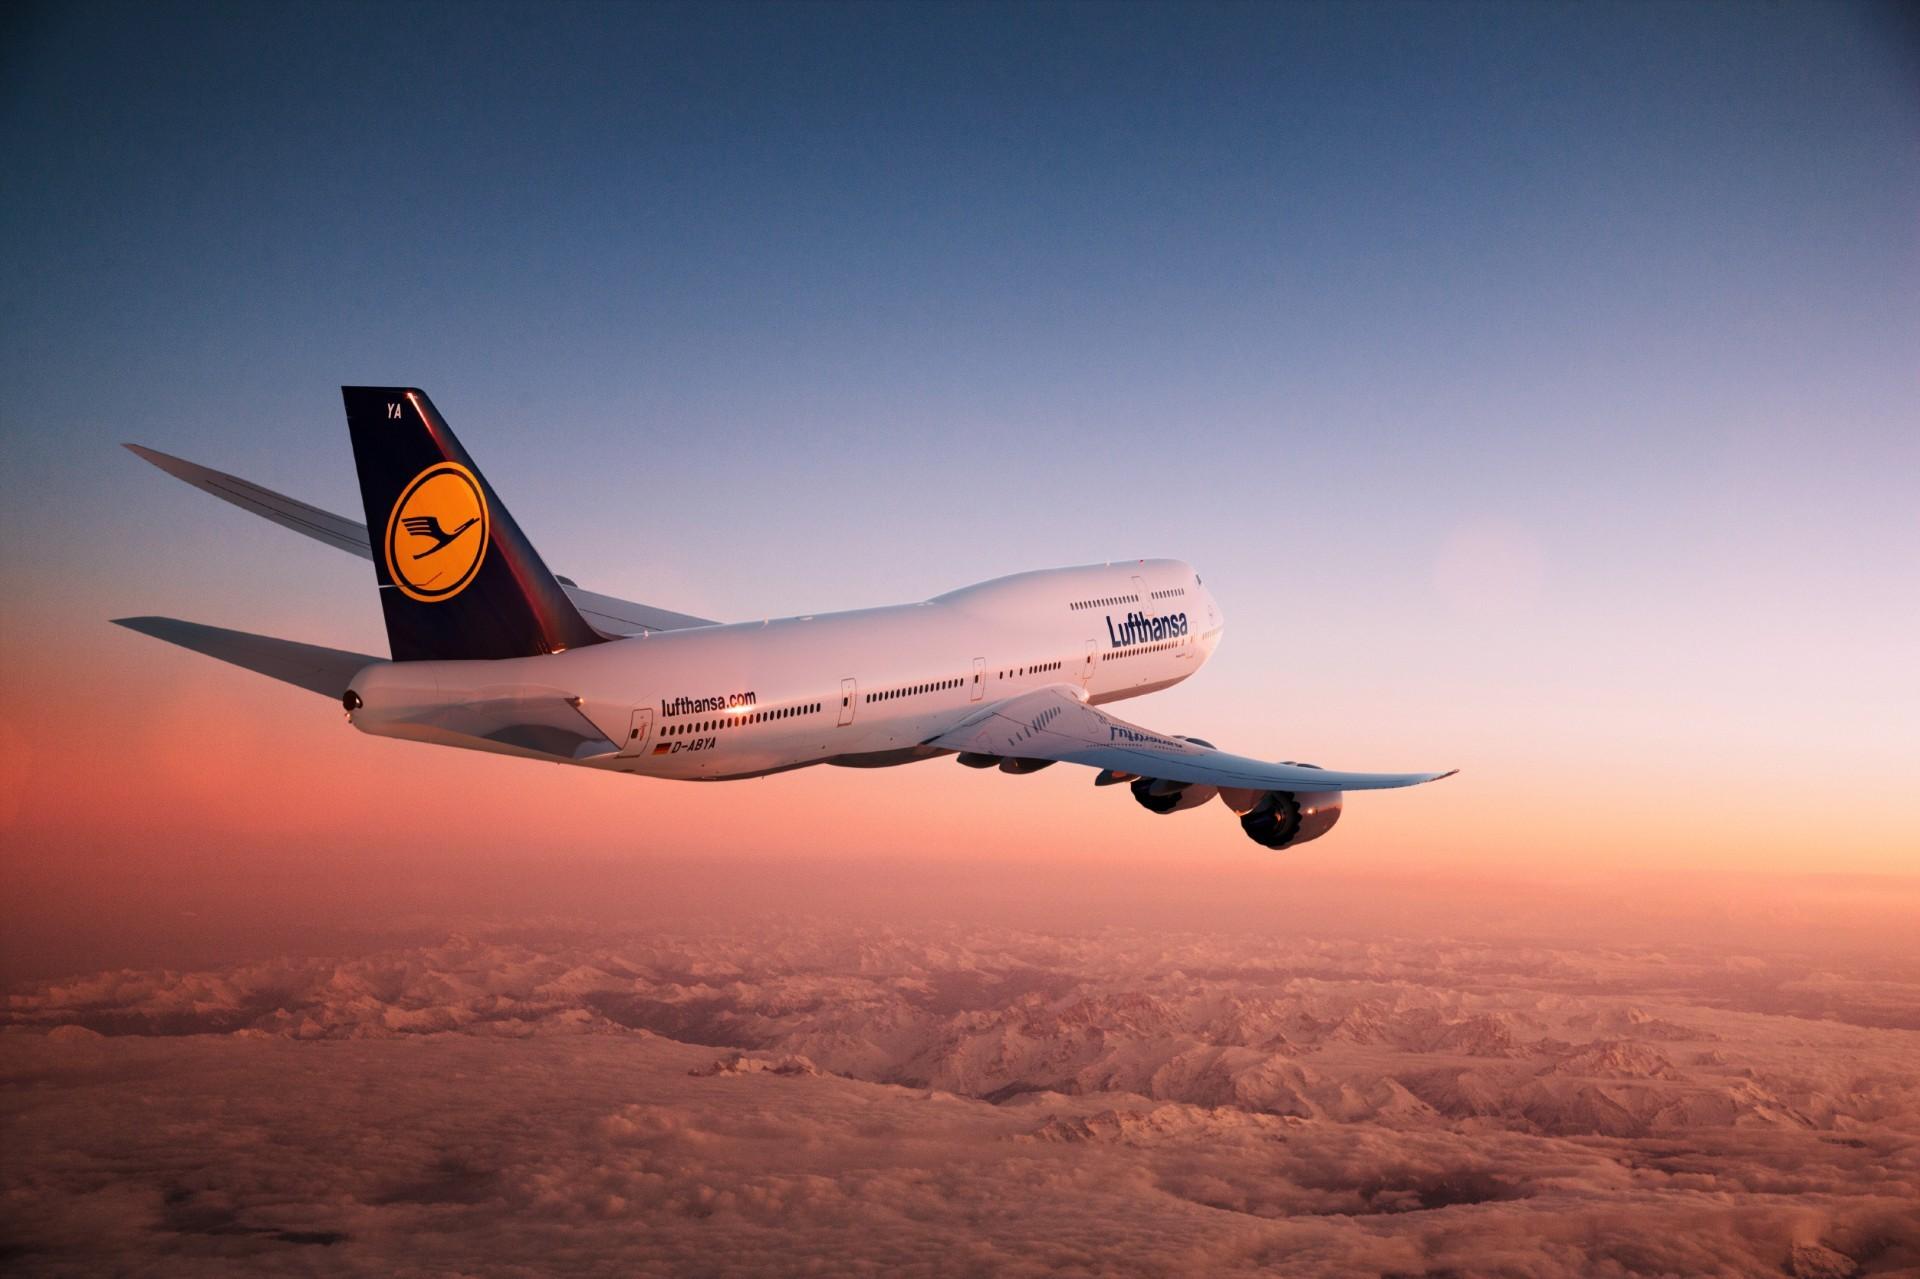 Обои Lufthansa. Авиация foto 15